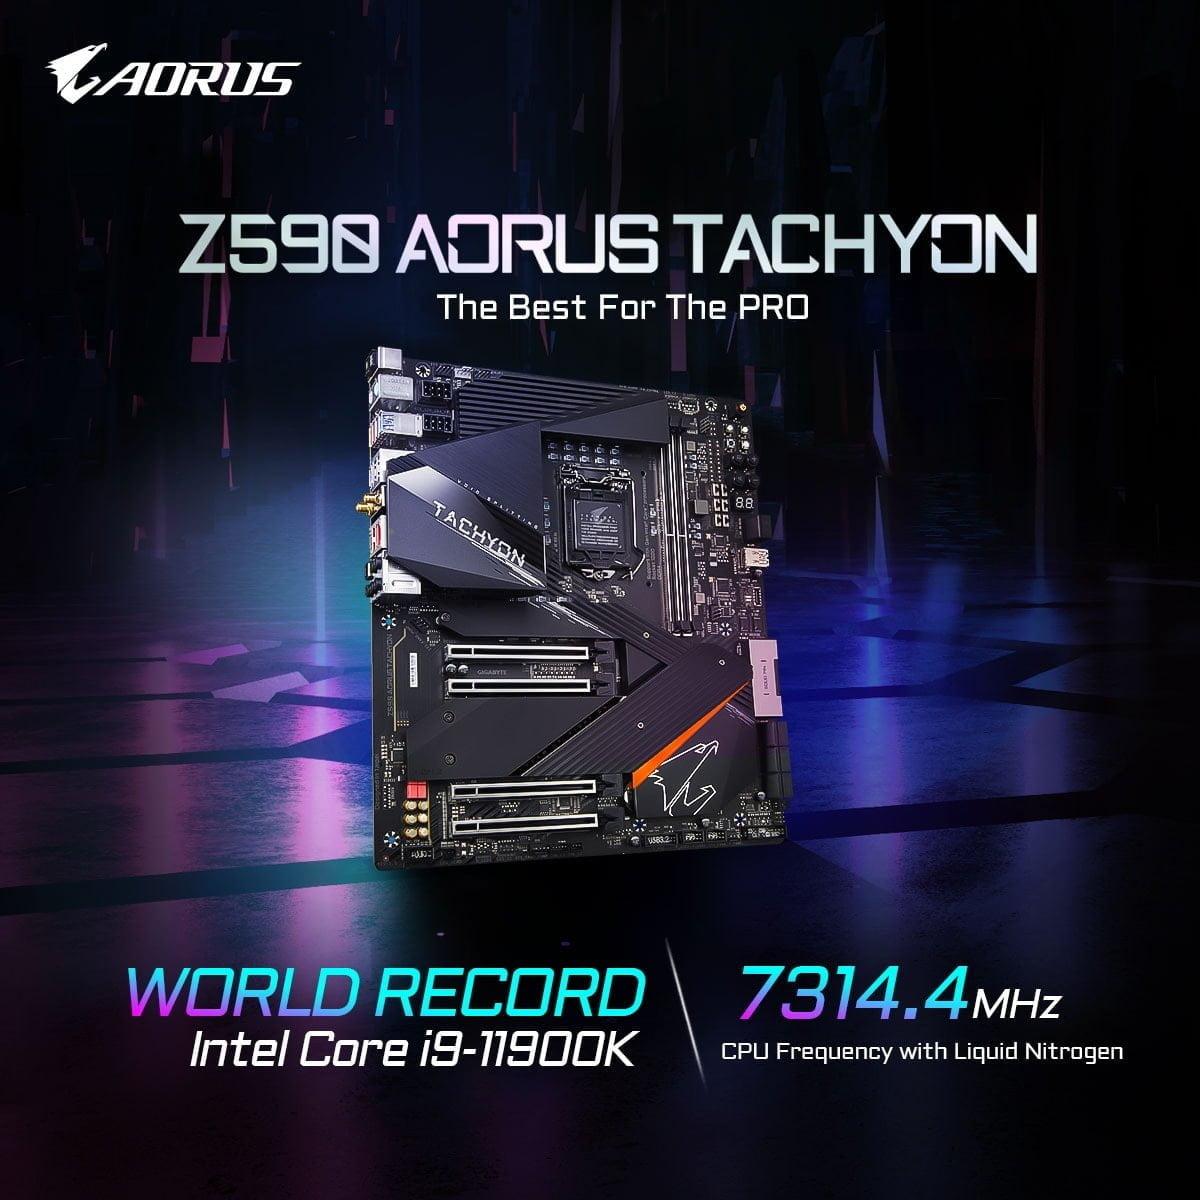 Core i9-11900K đạt mức xung kỉ lục 7314.4MHz với bo mạch chủ GIGABYTE Z590 AORUS TACHYON